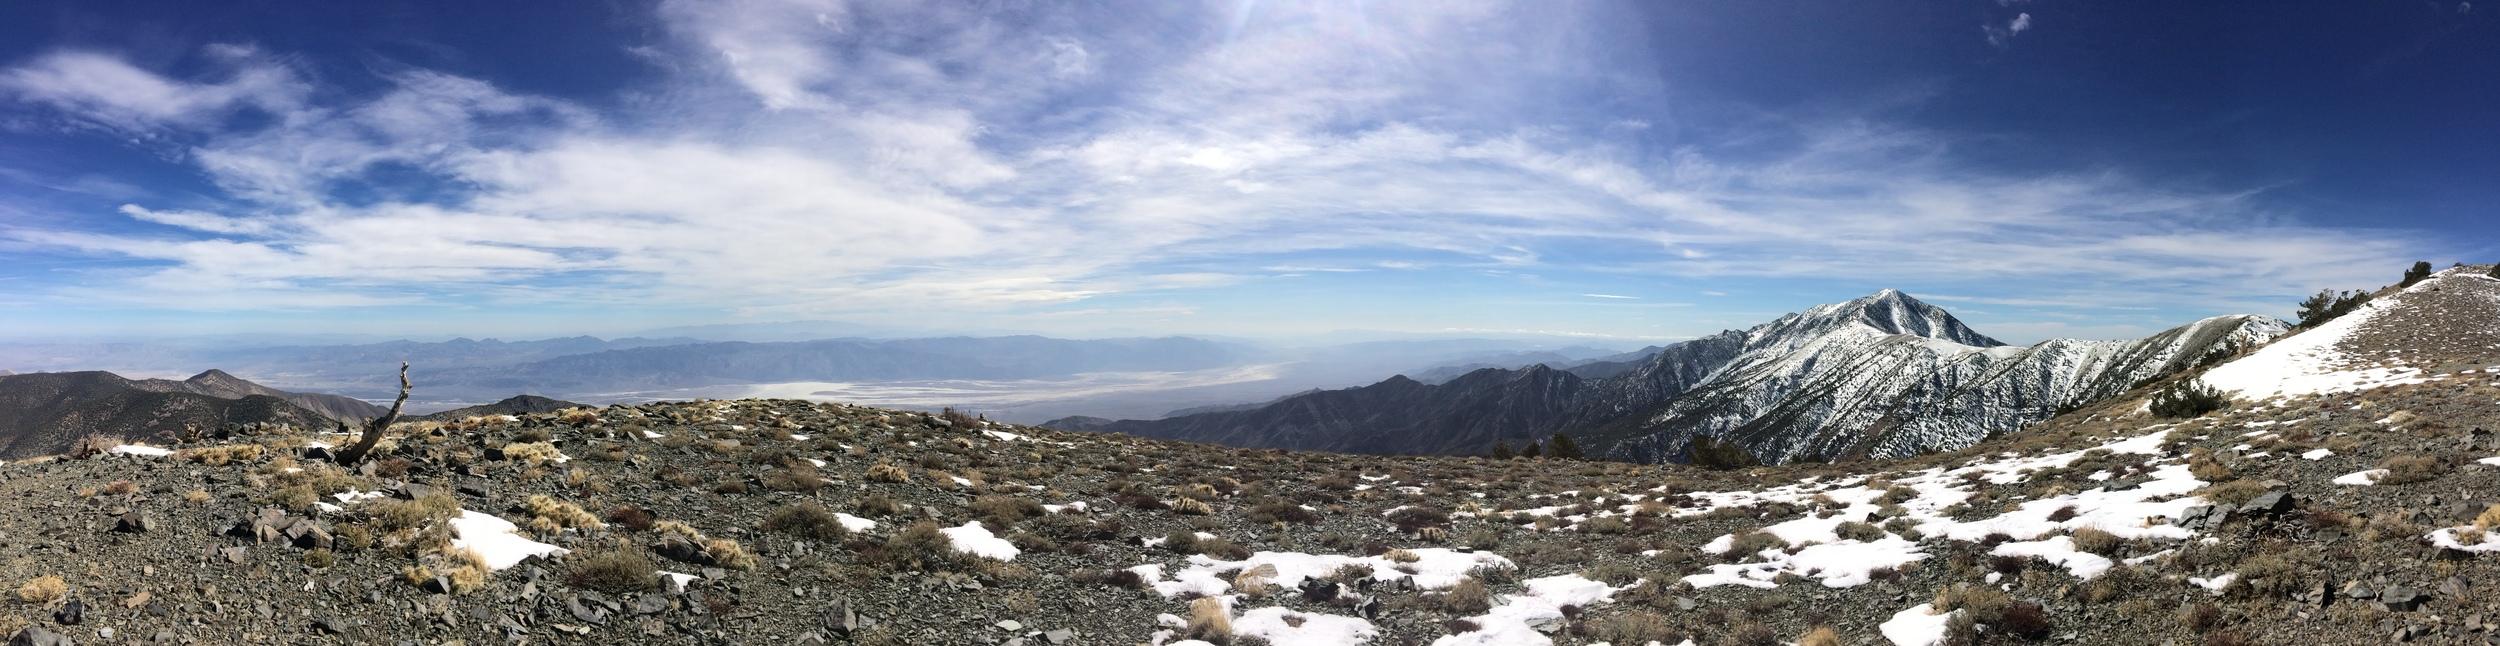 Telescope Peak, Bennett Peak, and Death Valley, March 2016